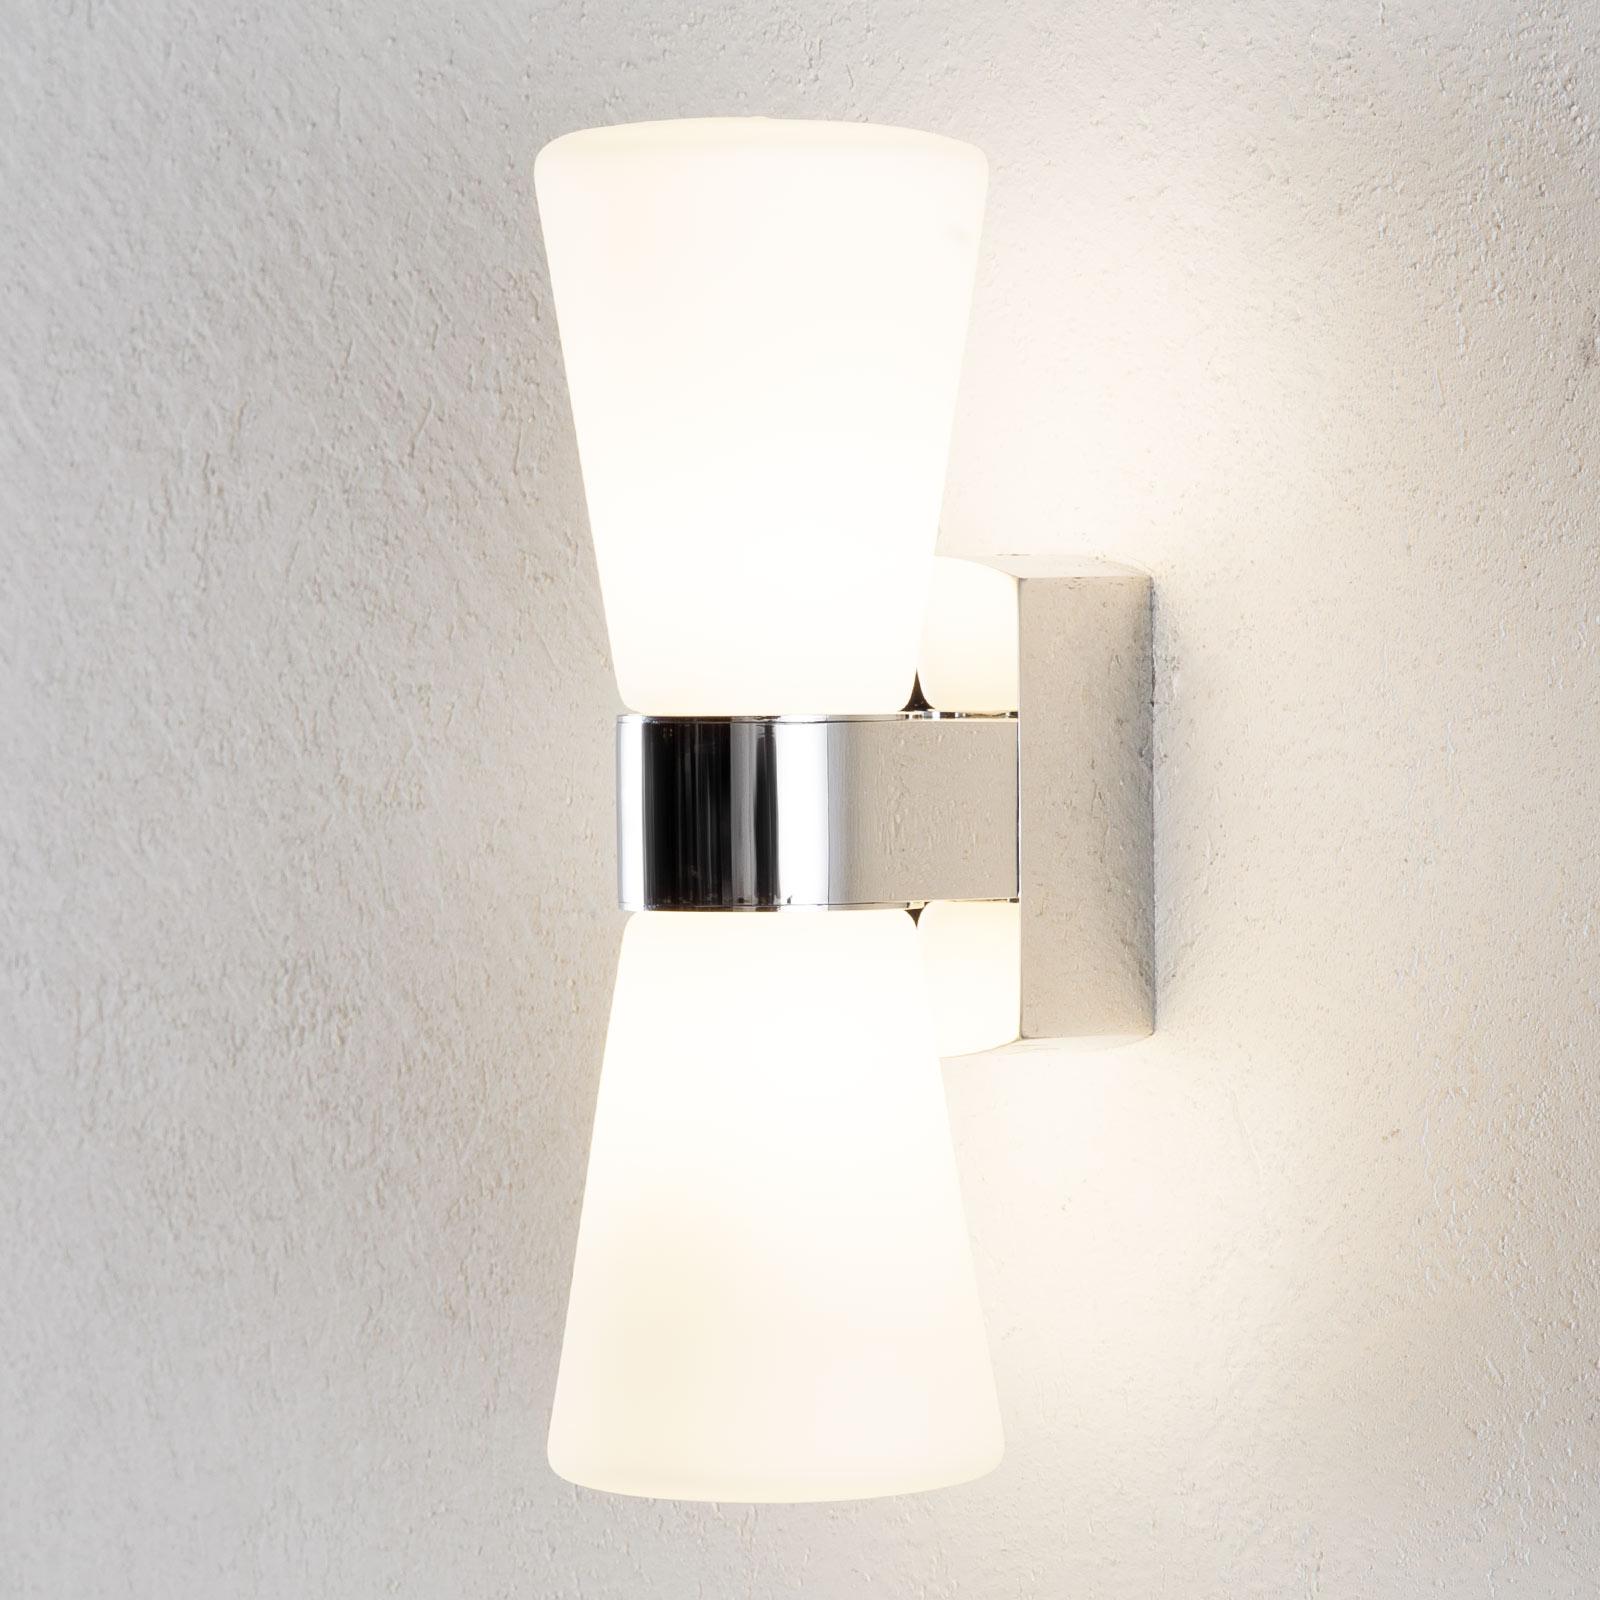 Elegante applique LED Cailin - IP44